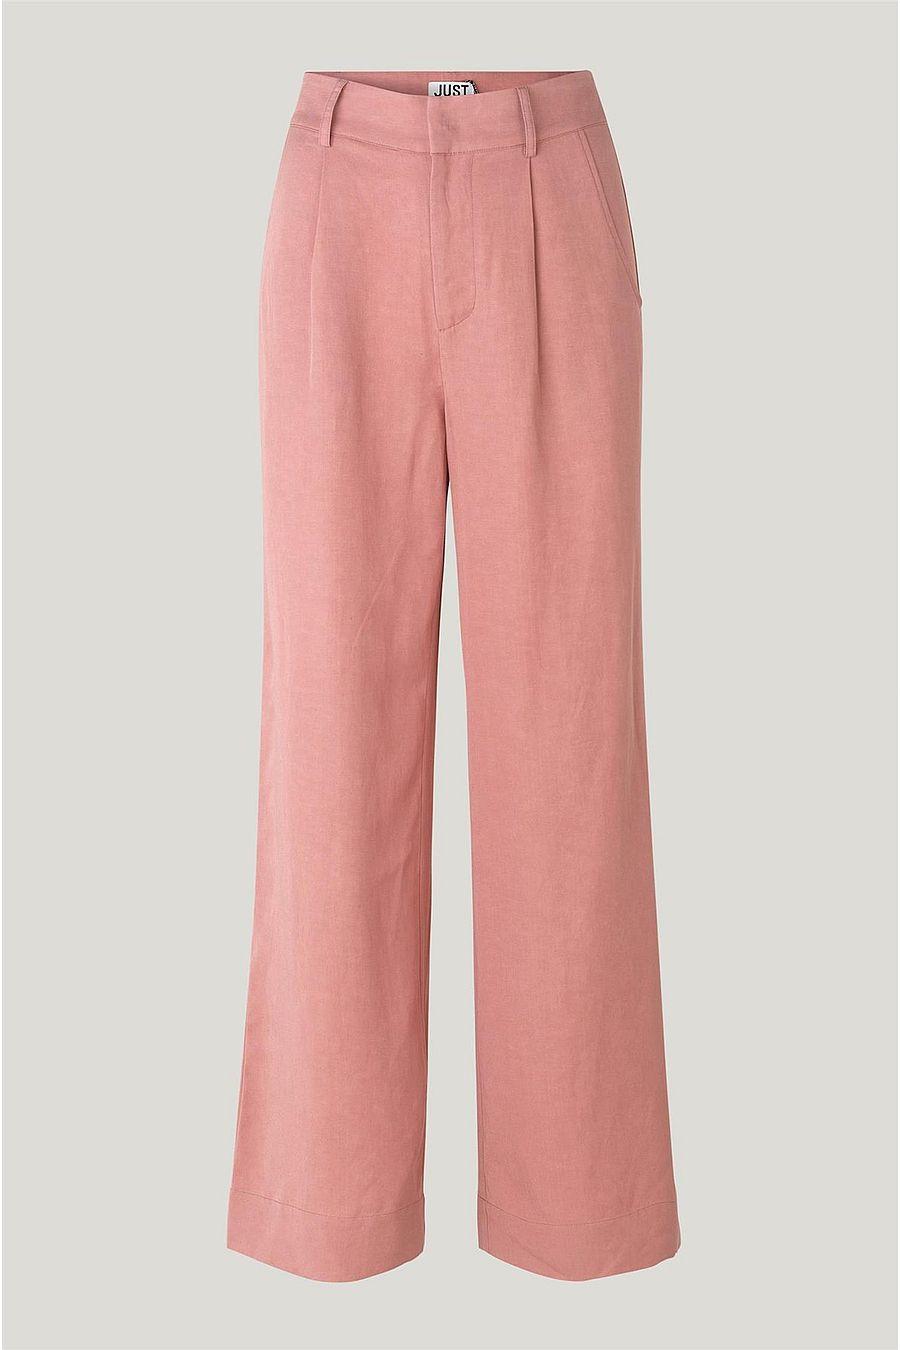 Just Female Priya Trousers